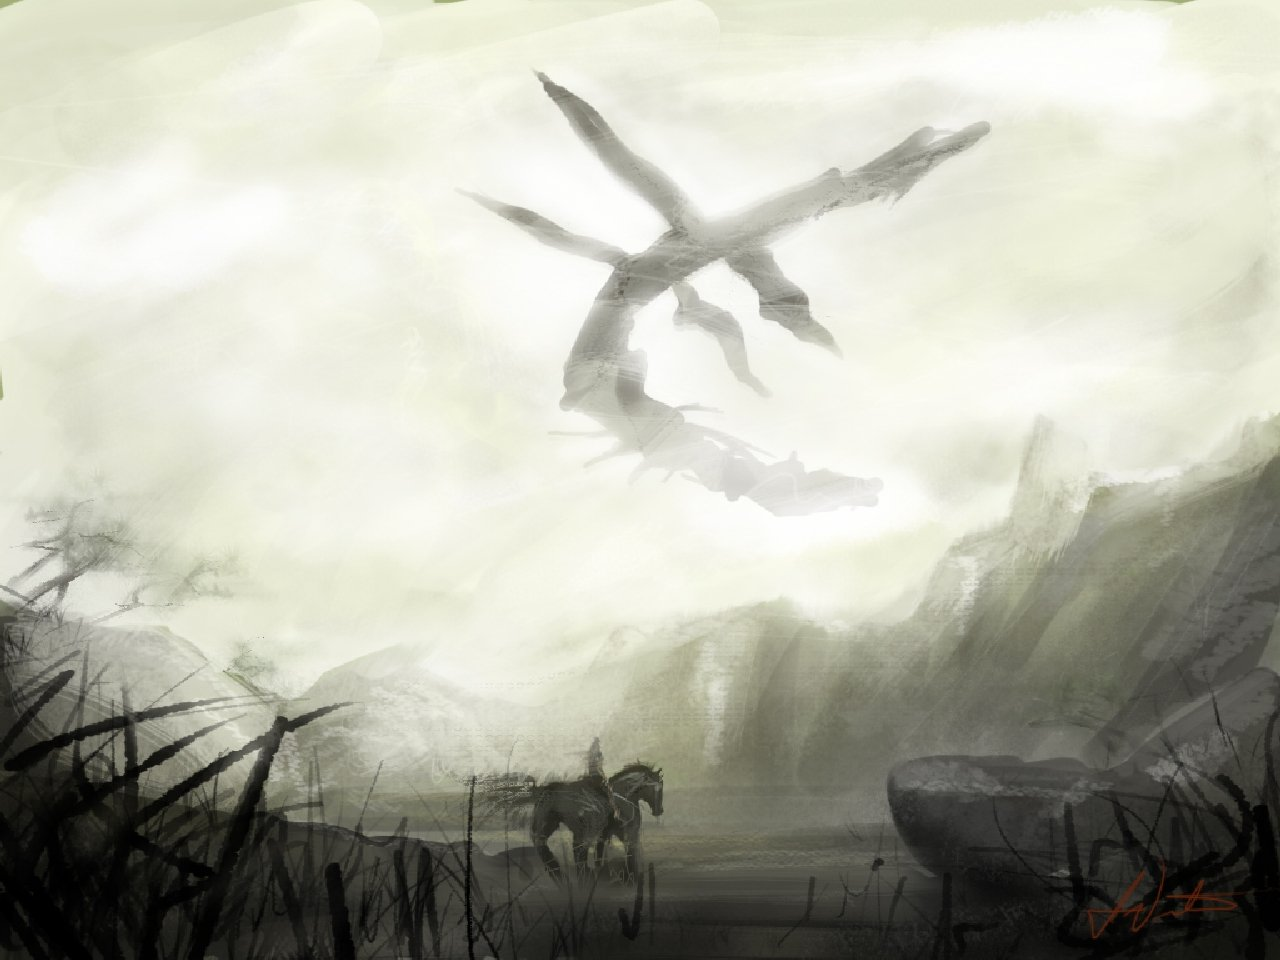 Игра. Легенда. История. Шедевр - Shadow of the Colossus!. - Изображение 3